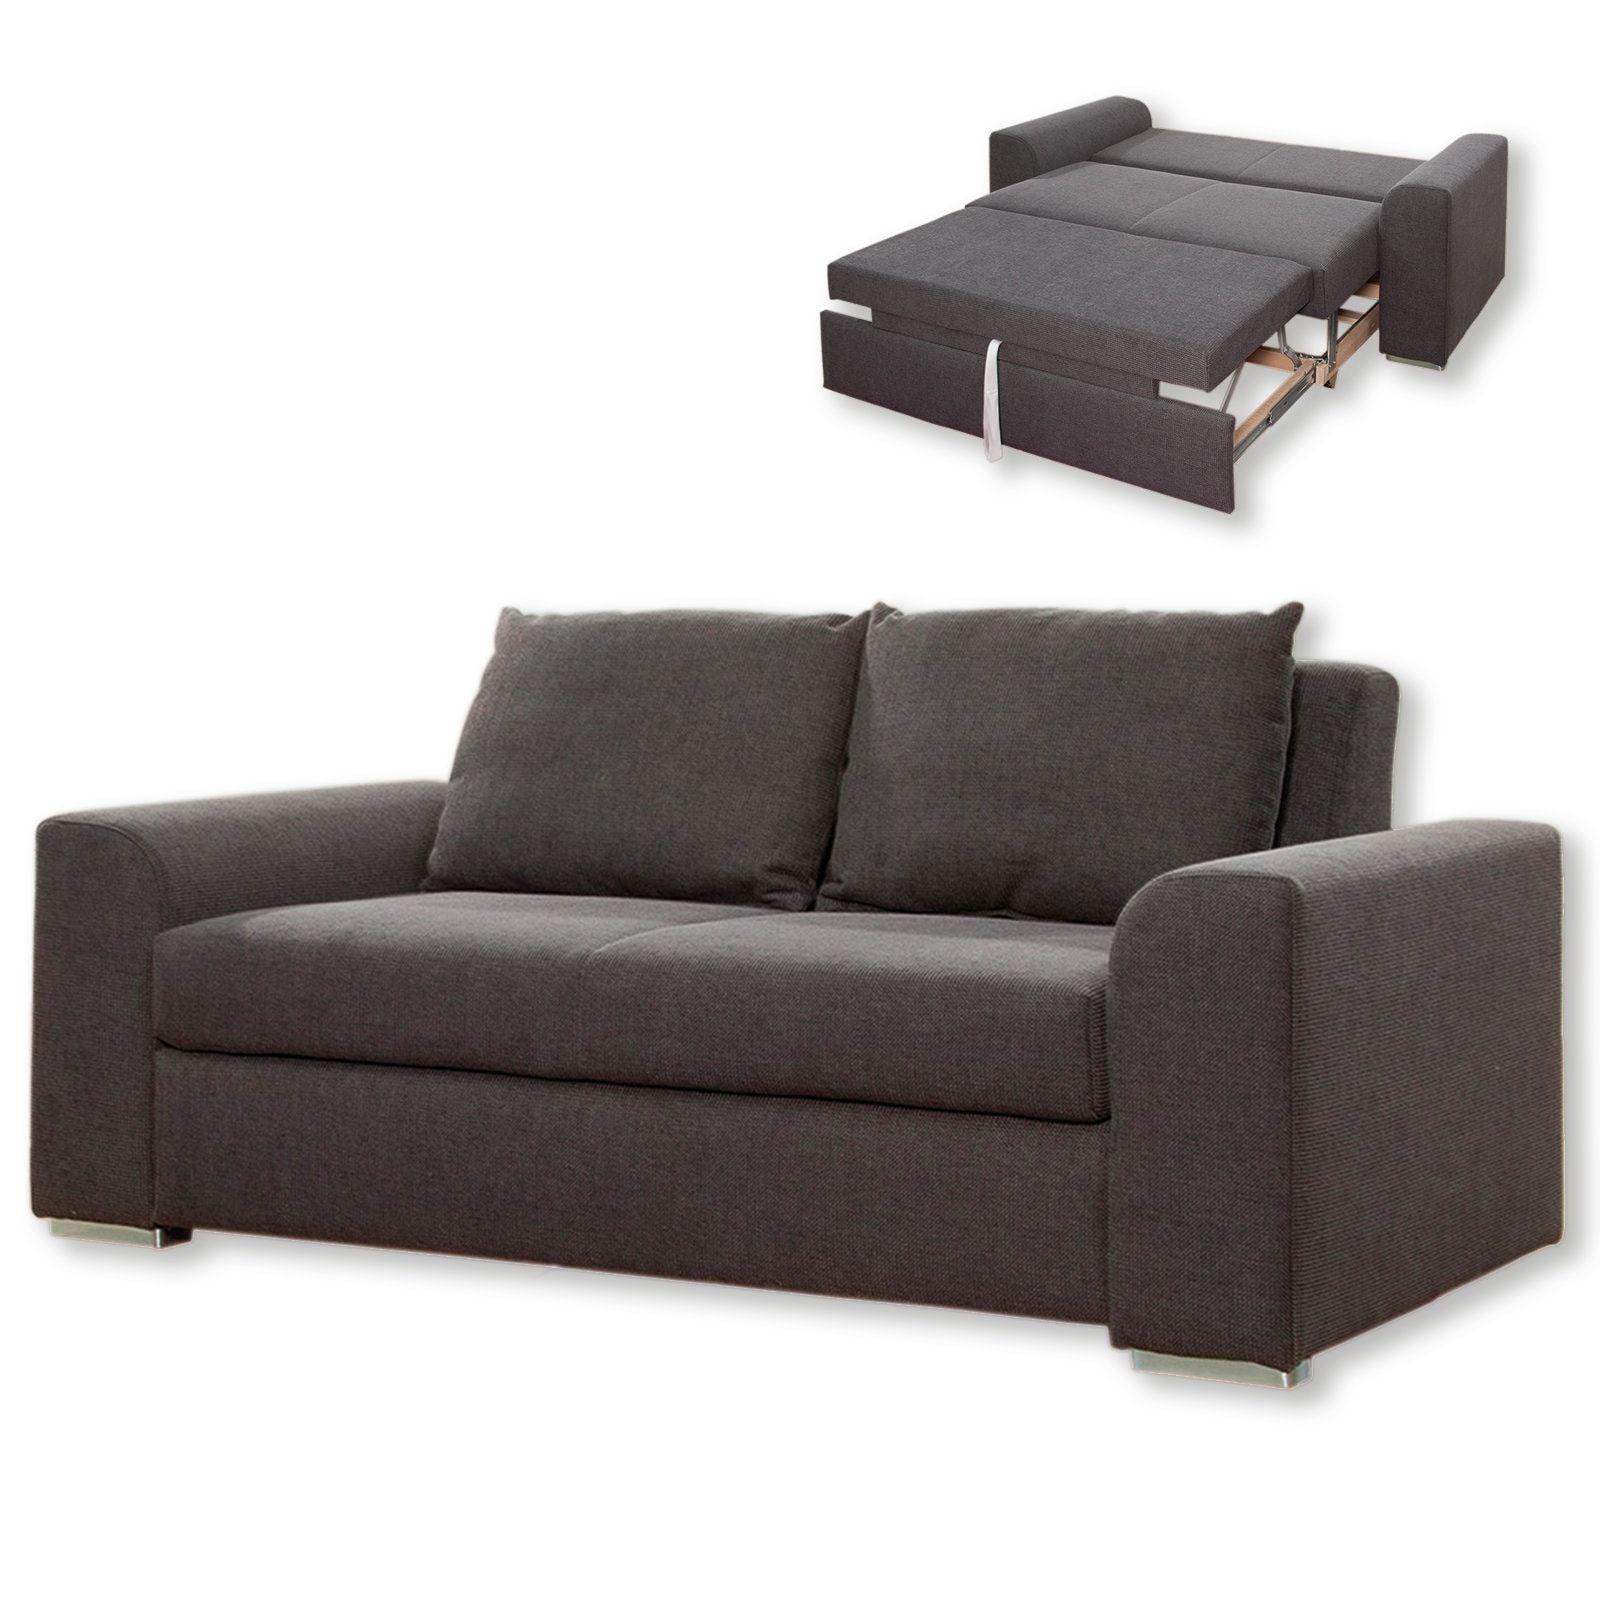 Couch Sofa Jugendzimmer